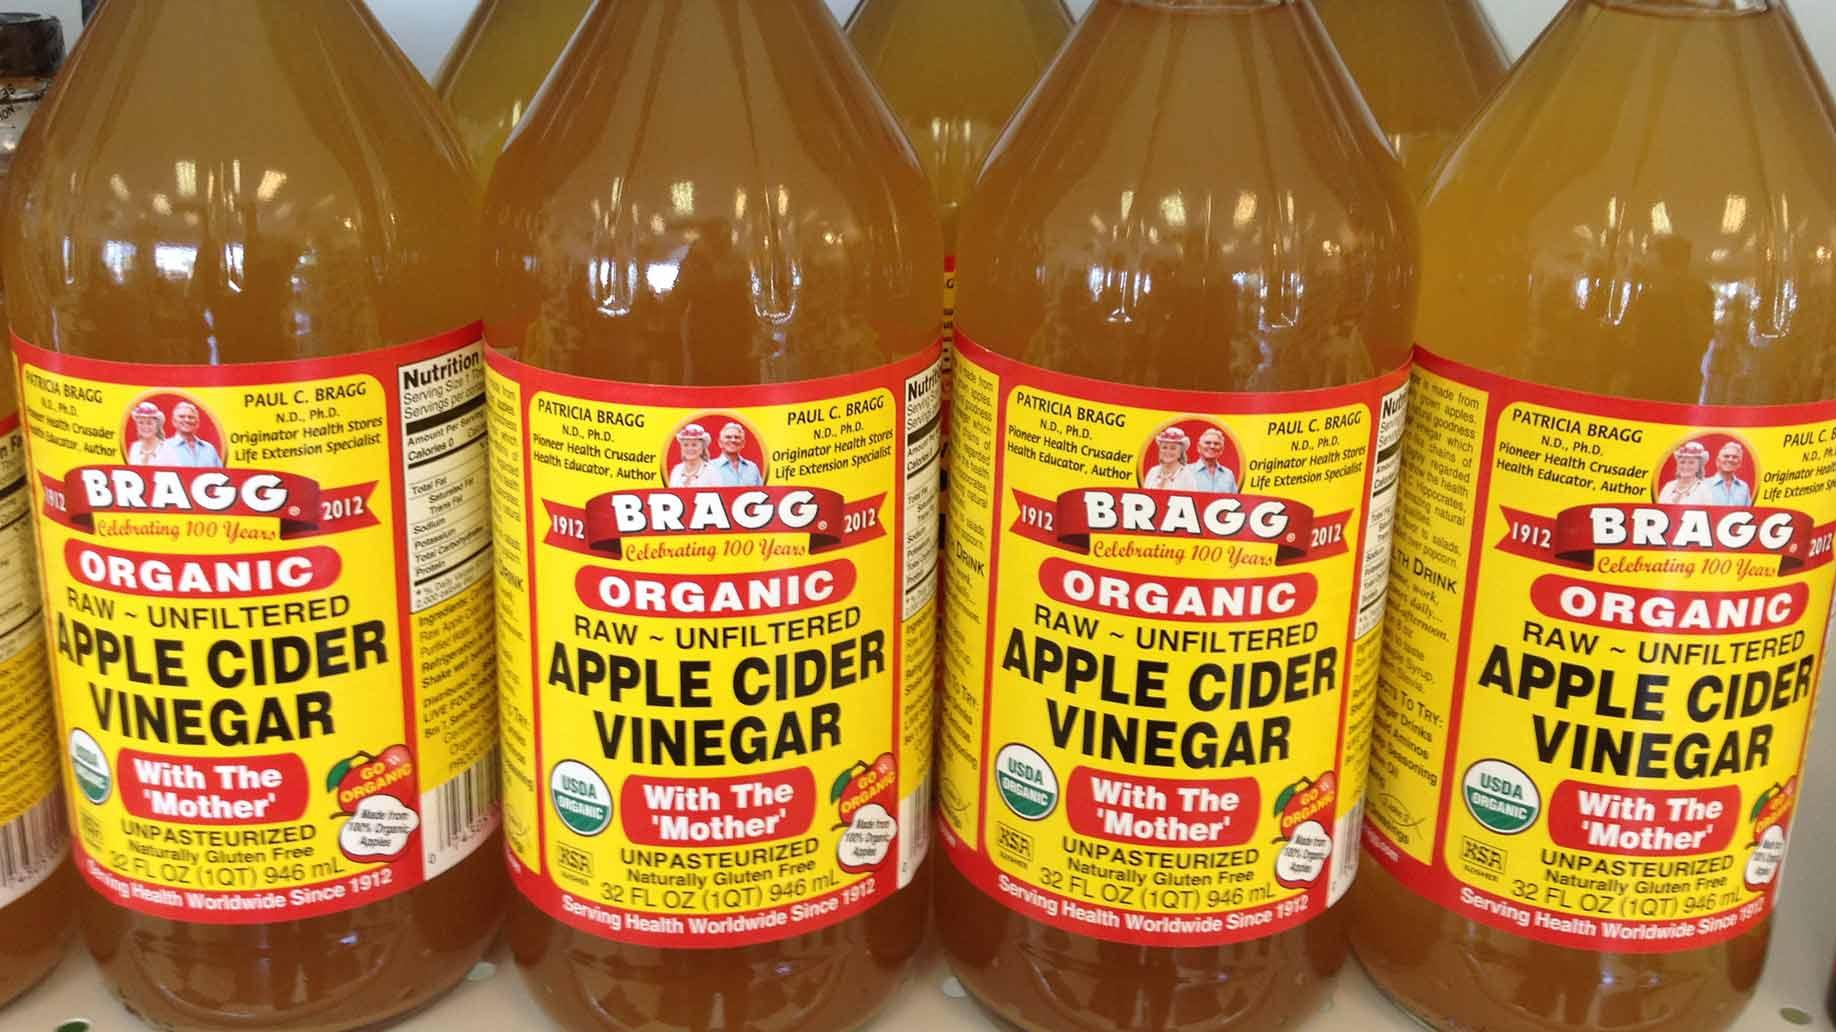 bragg organic raw unfiltered apple cider vinegar glass jar